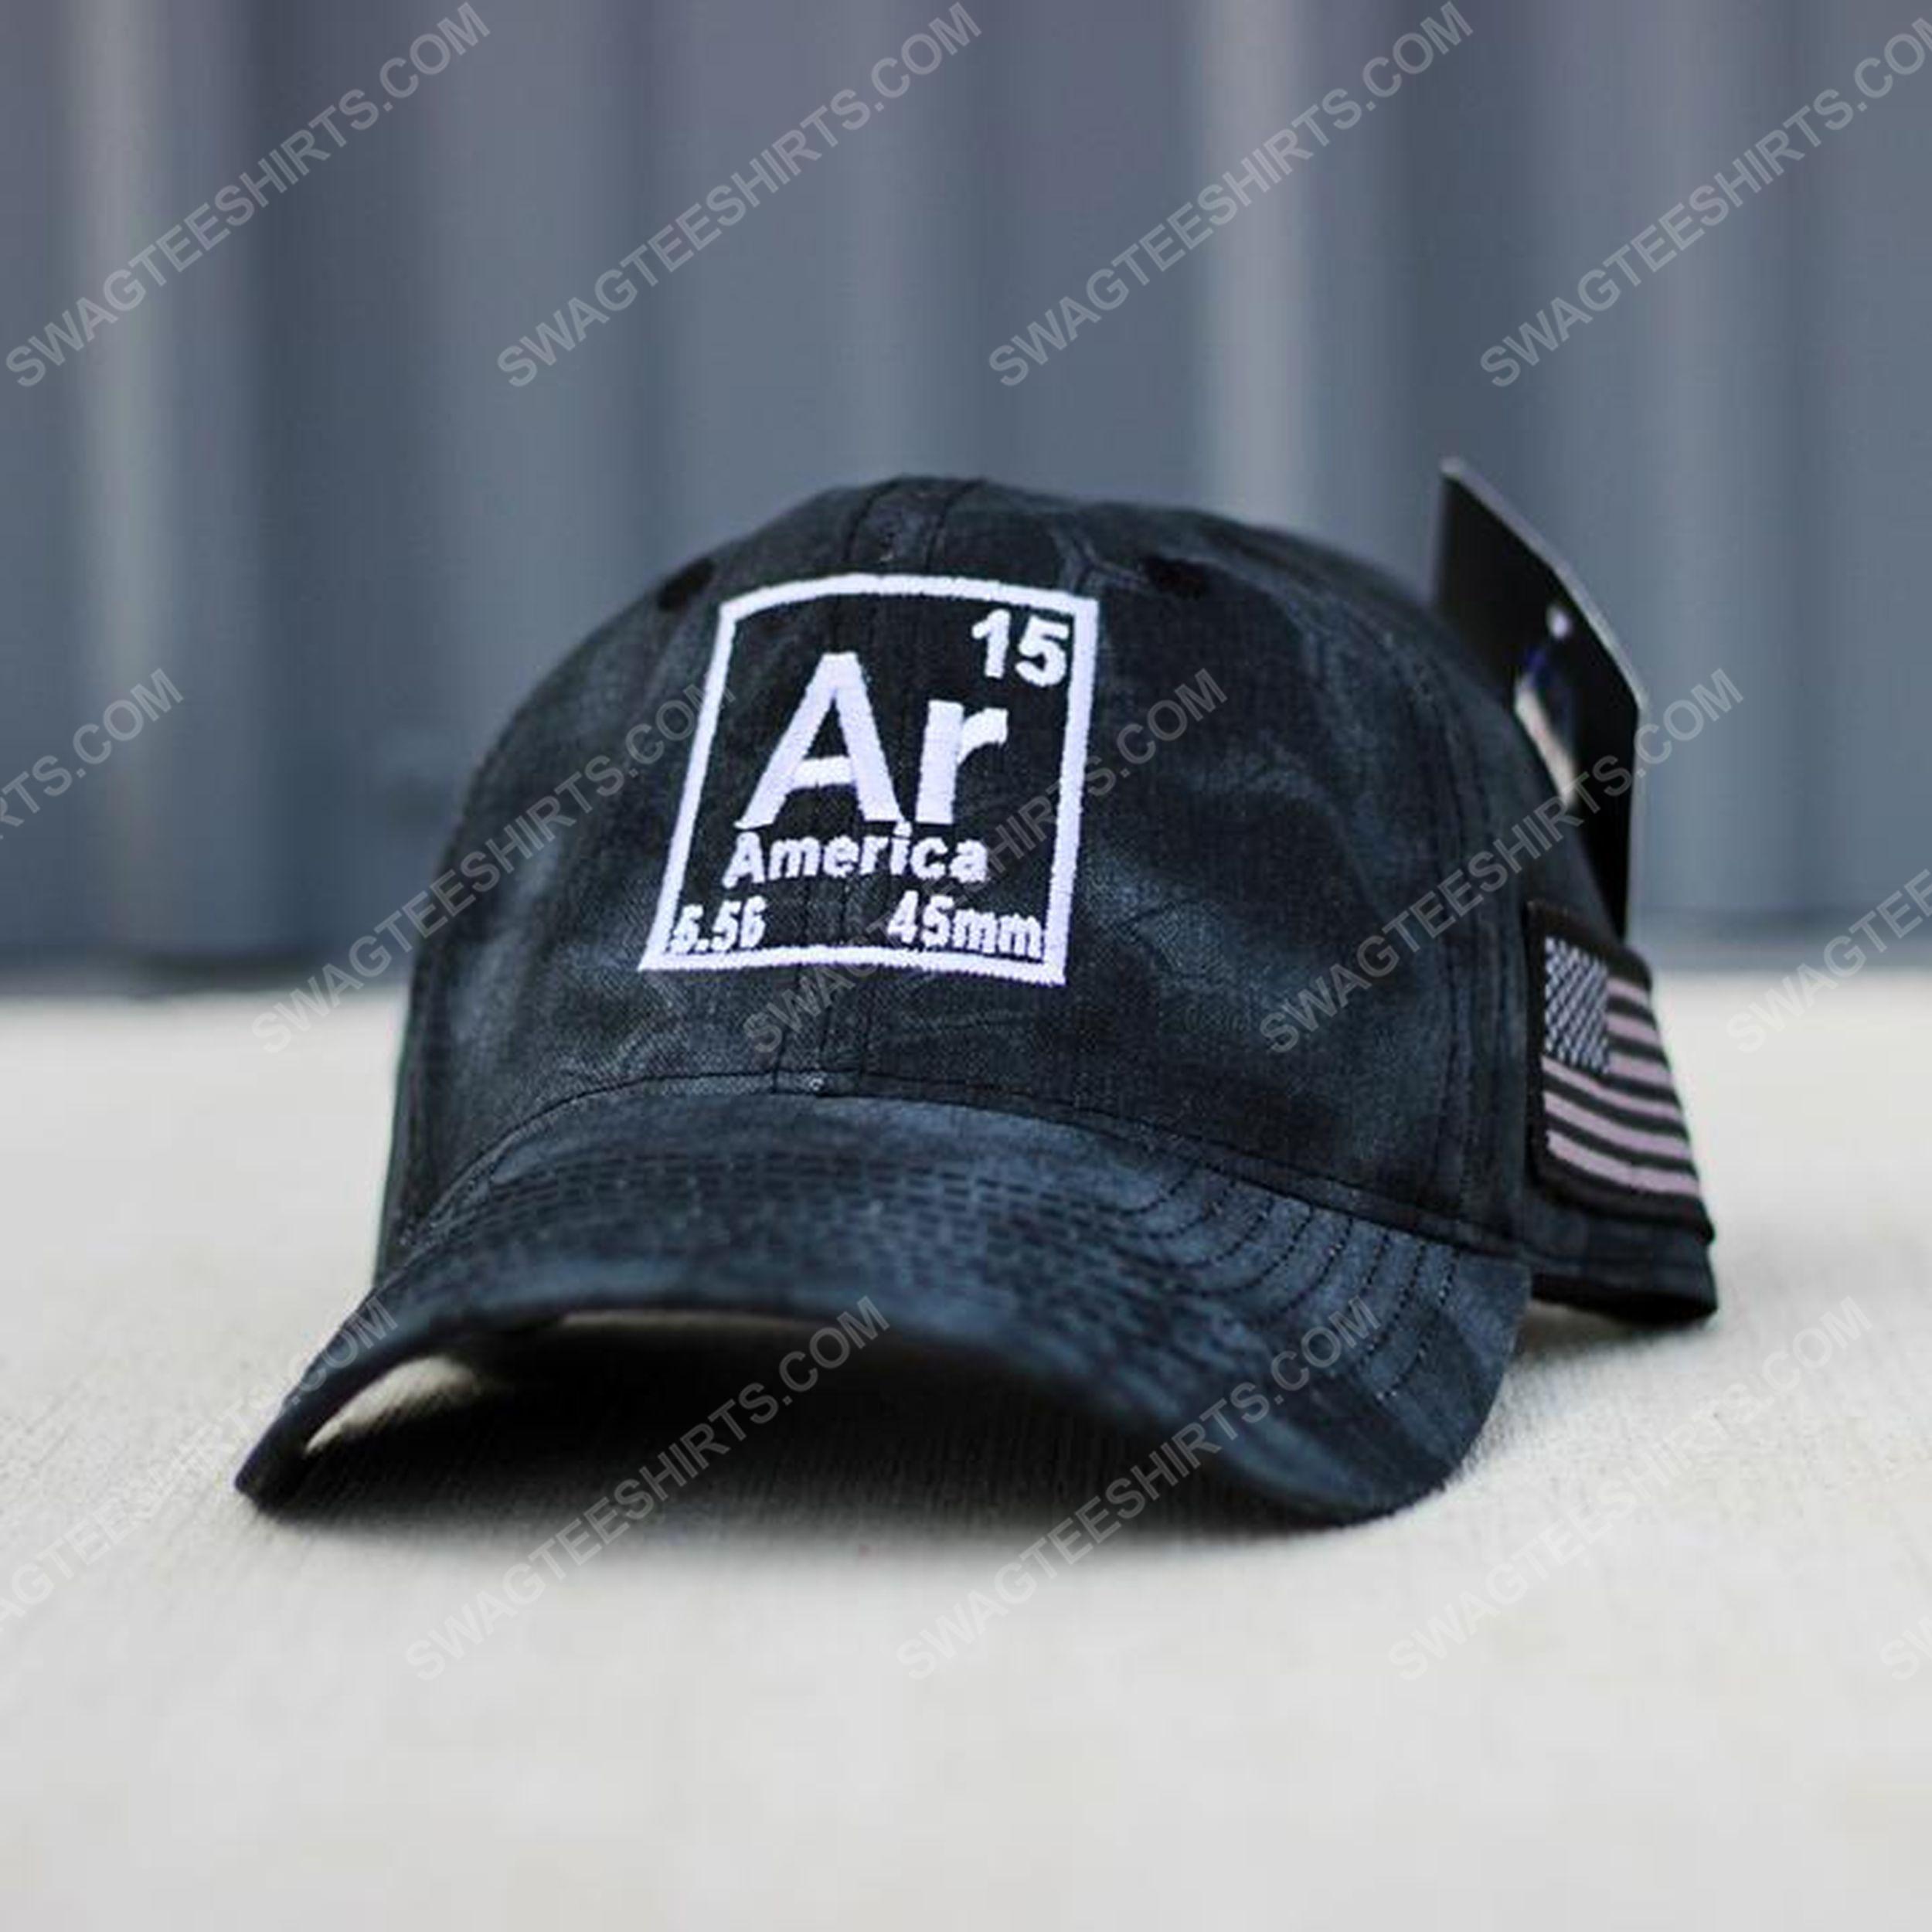 Ar 15 american full print classic hat 1